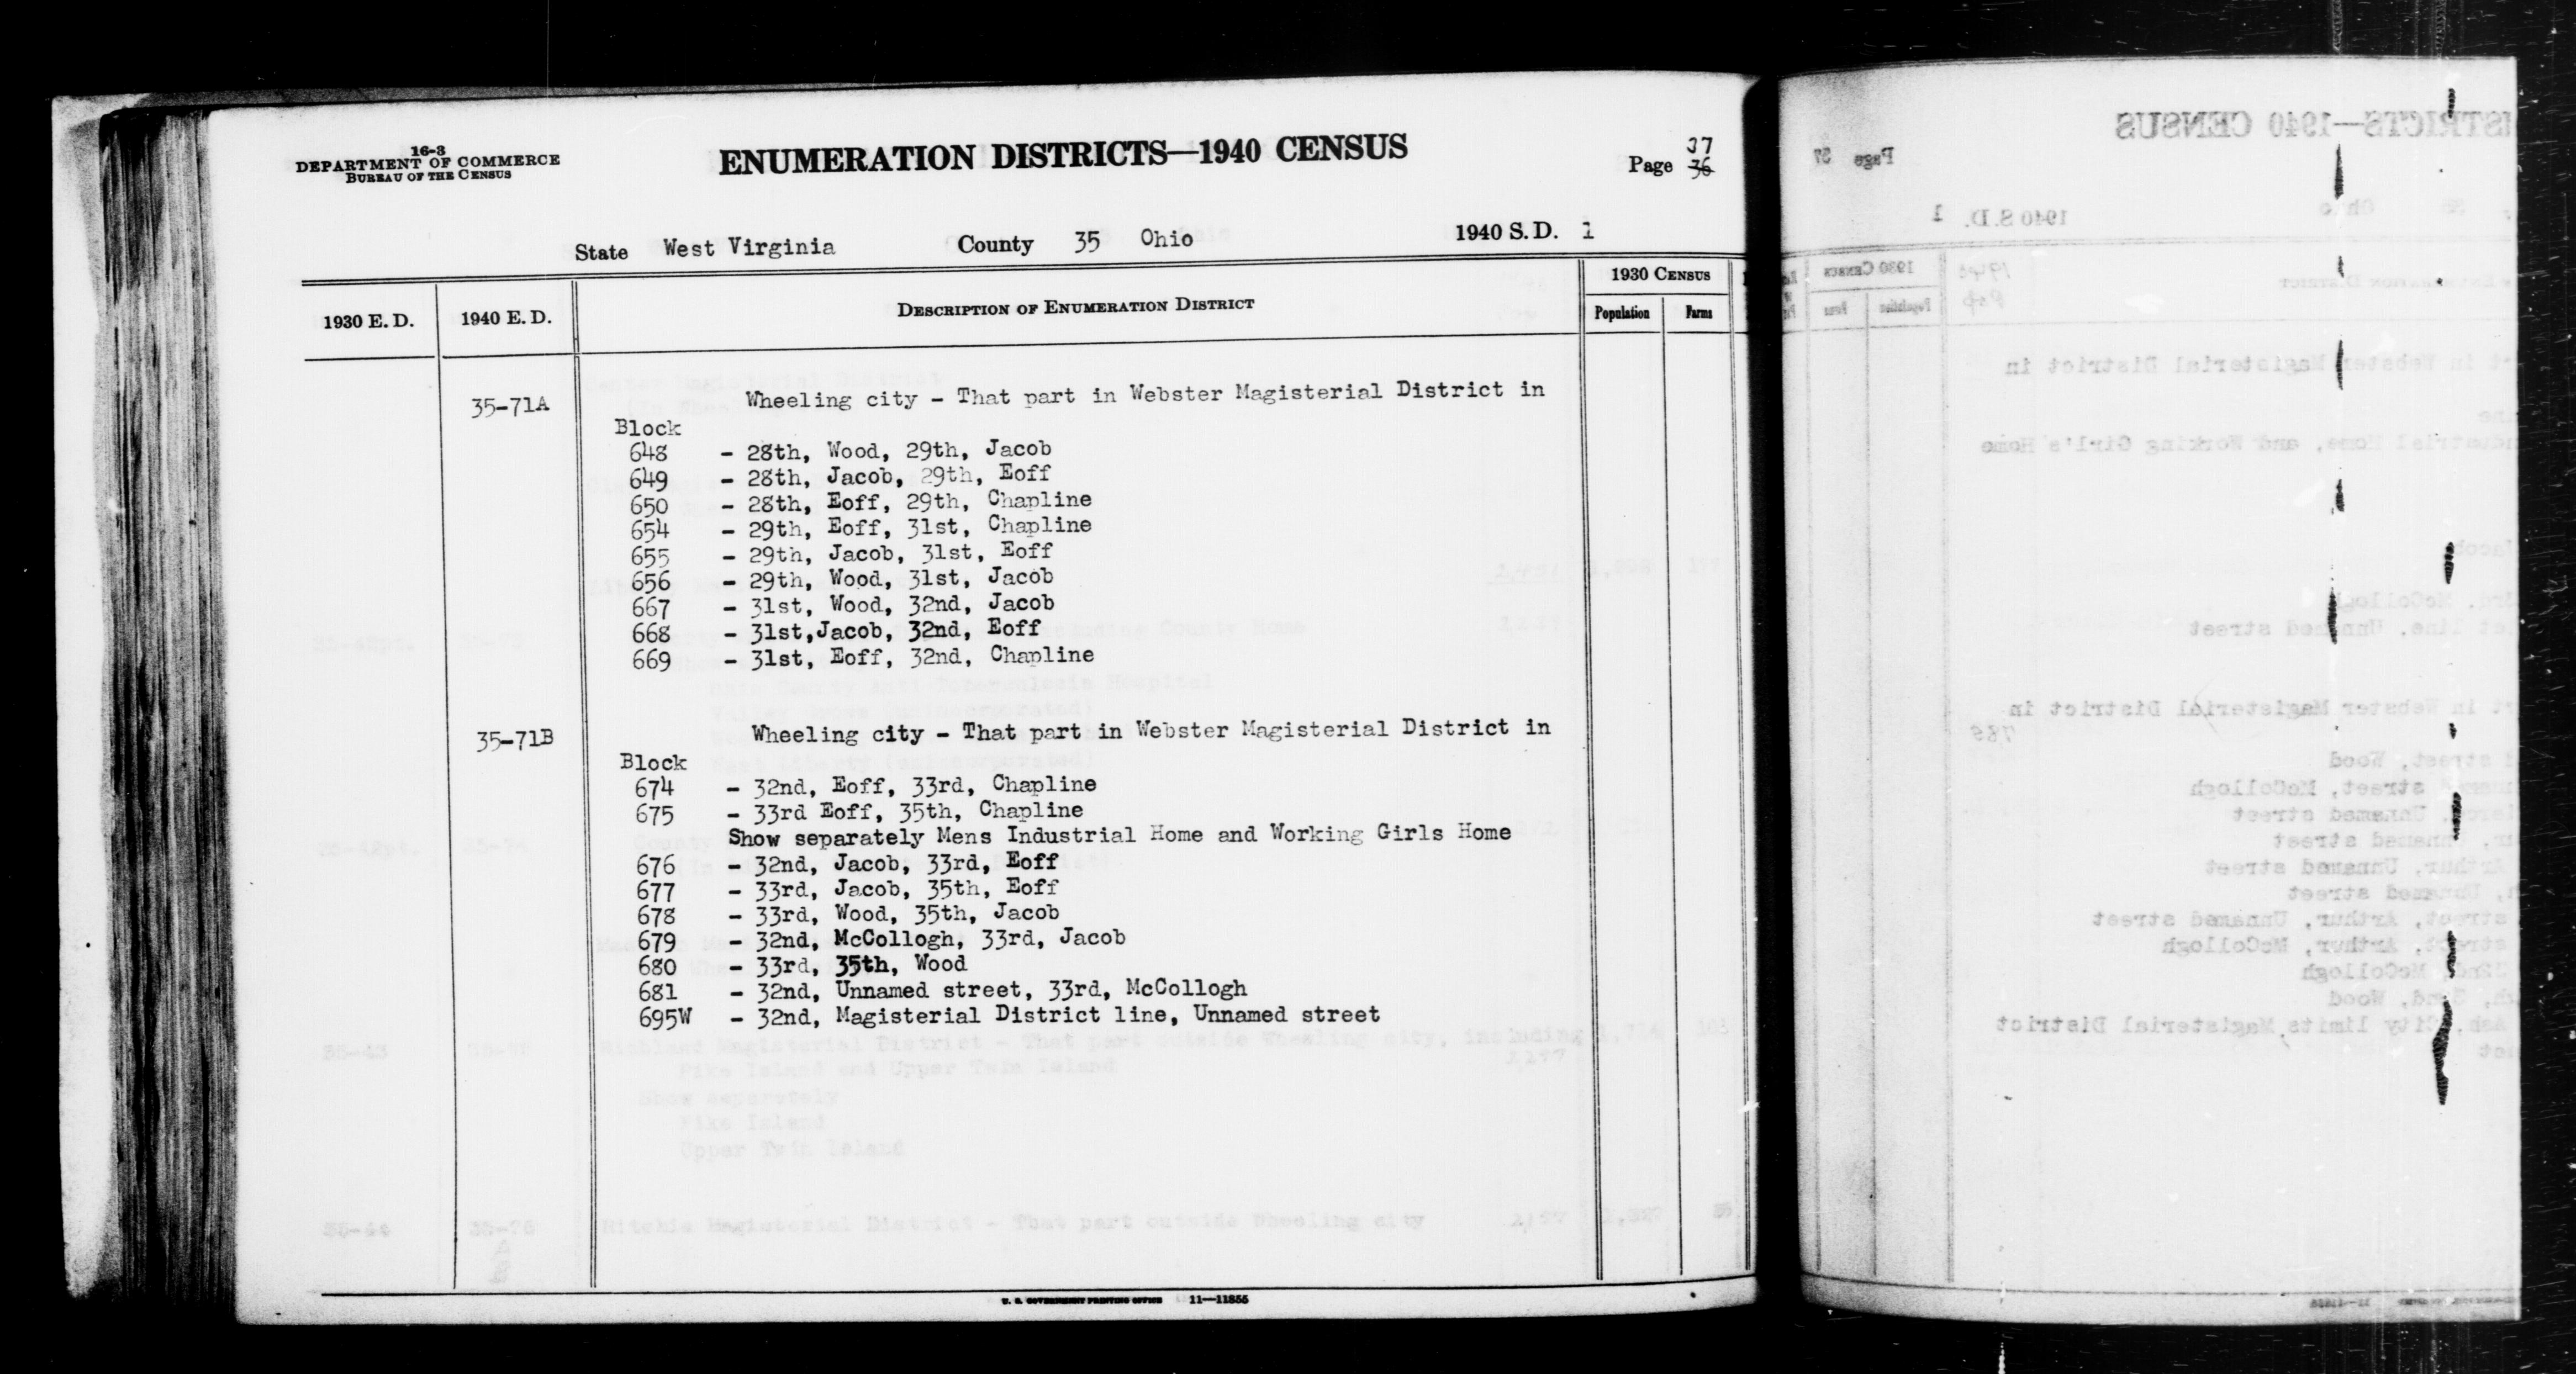 1940 Census Enumeration District Descriptions - West Virginia - Ohio County - ED 35-71A, ED 35-71B